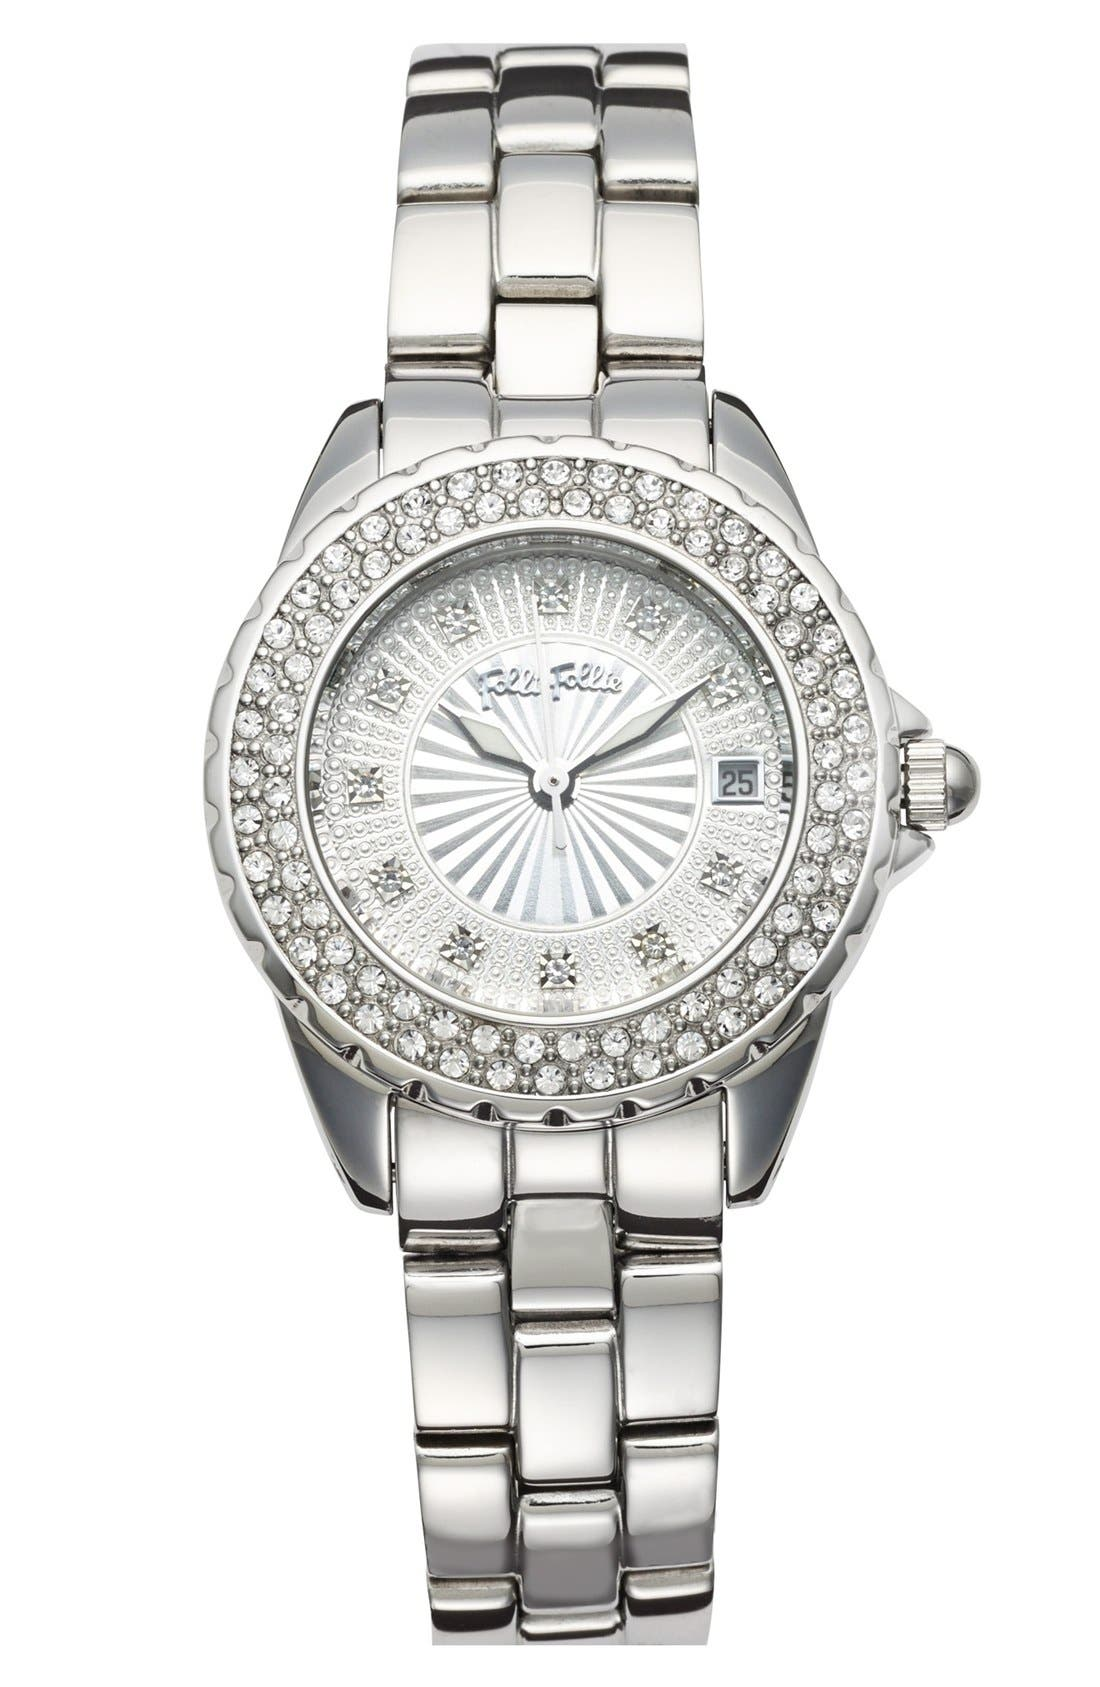 Alternate Image 1 Selected - Folli Follie 'Daydream' Crystal Bezel Bracelet Watch, 29mm